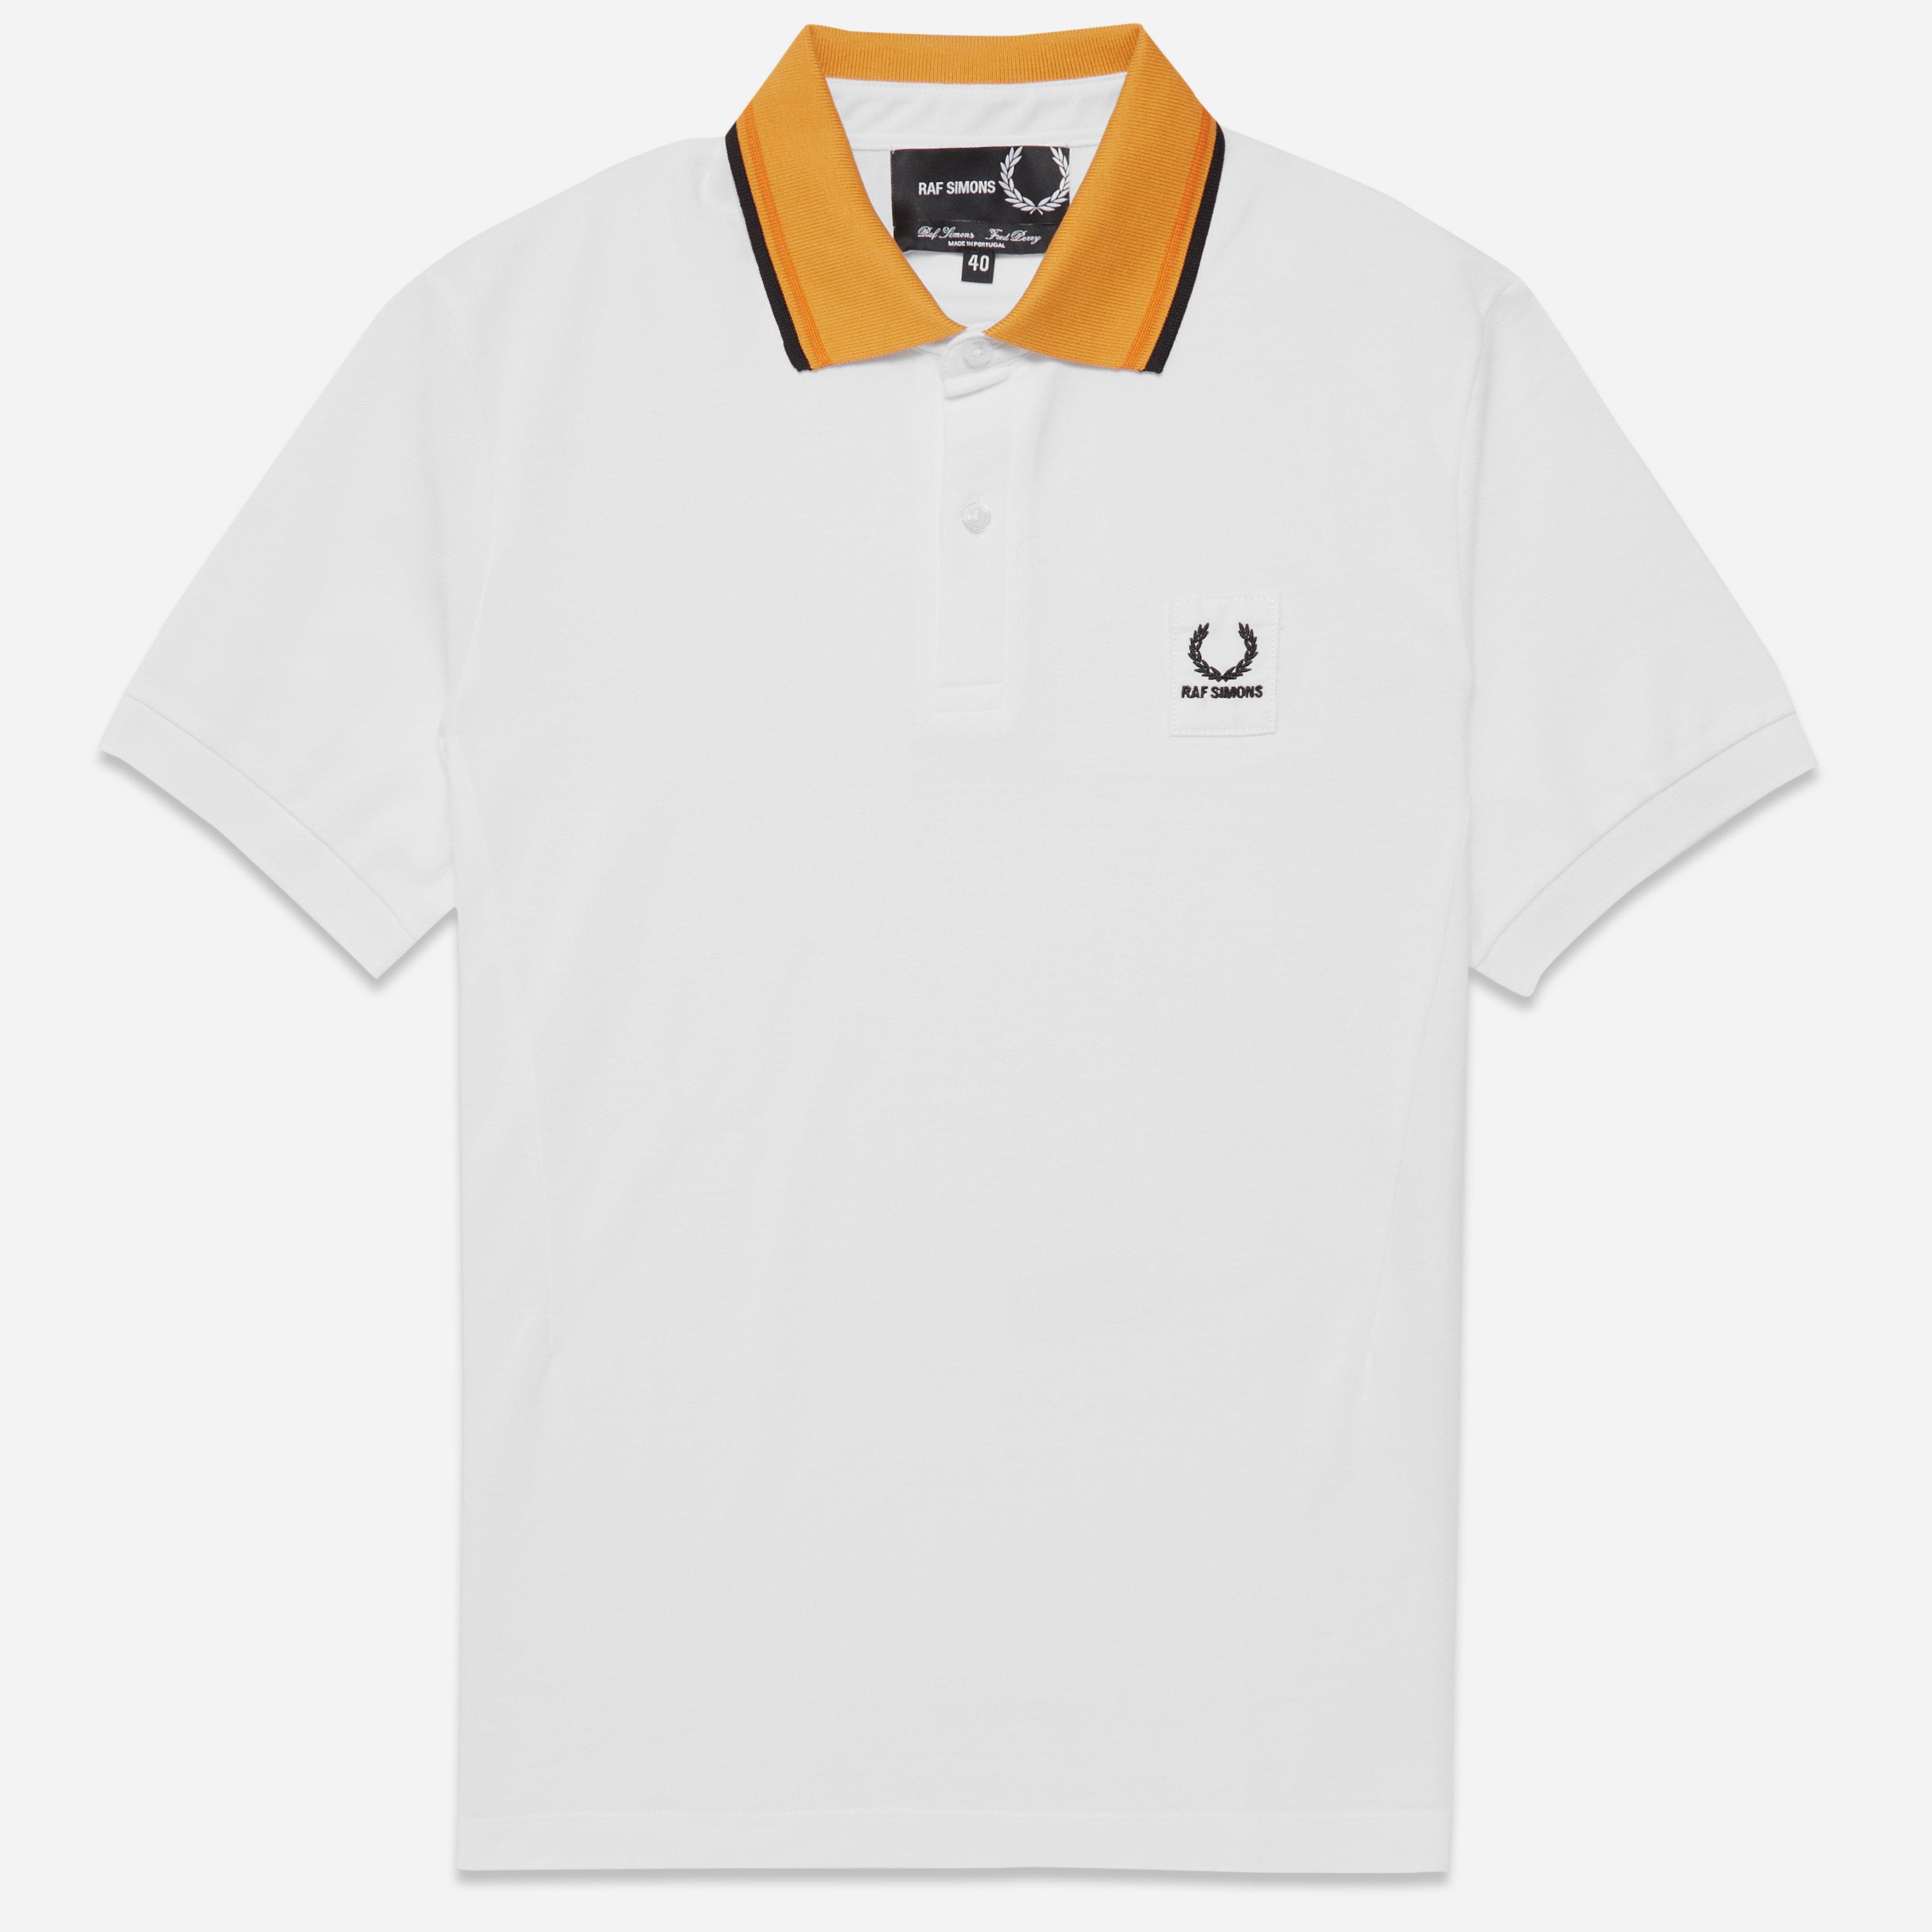 Fred Perry x Raf Simons Contrast Collar Pique Shirt